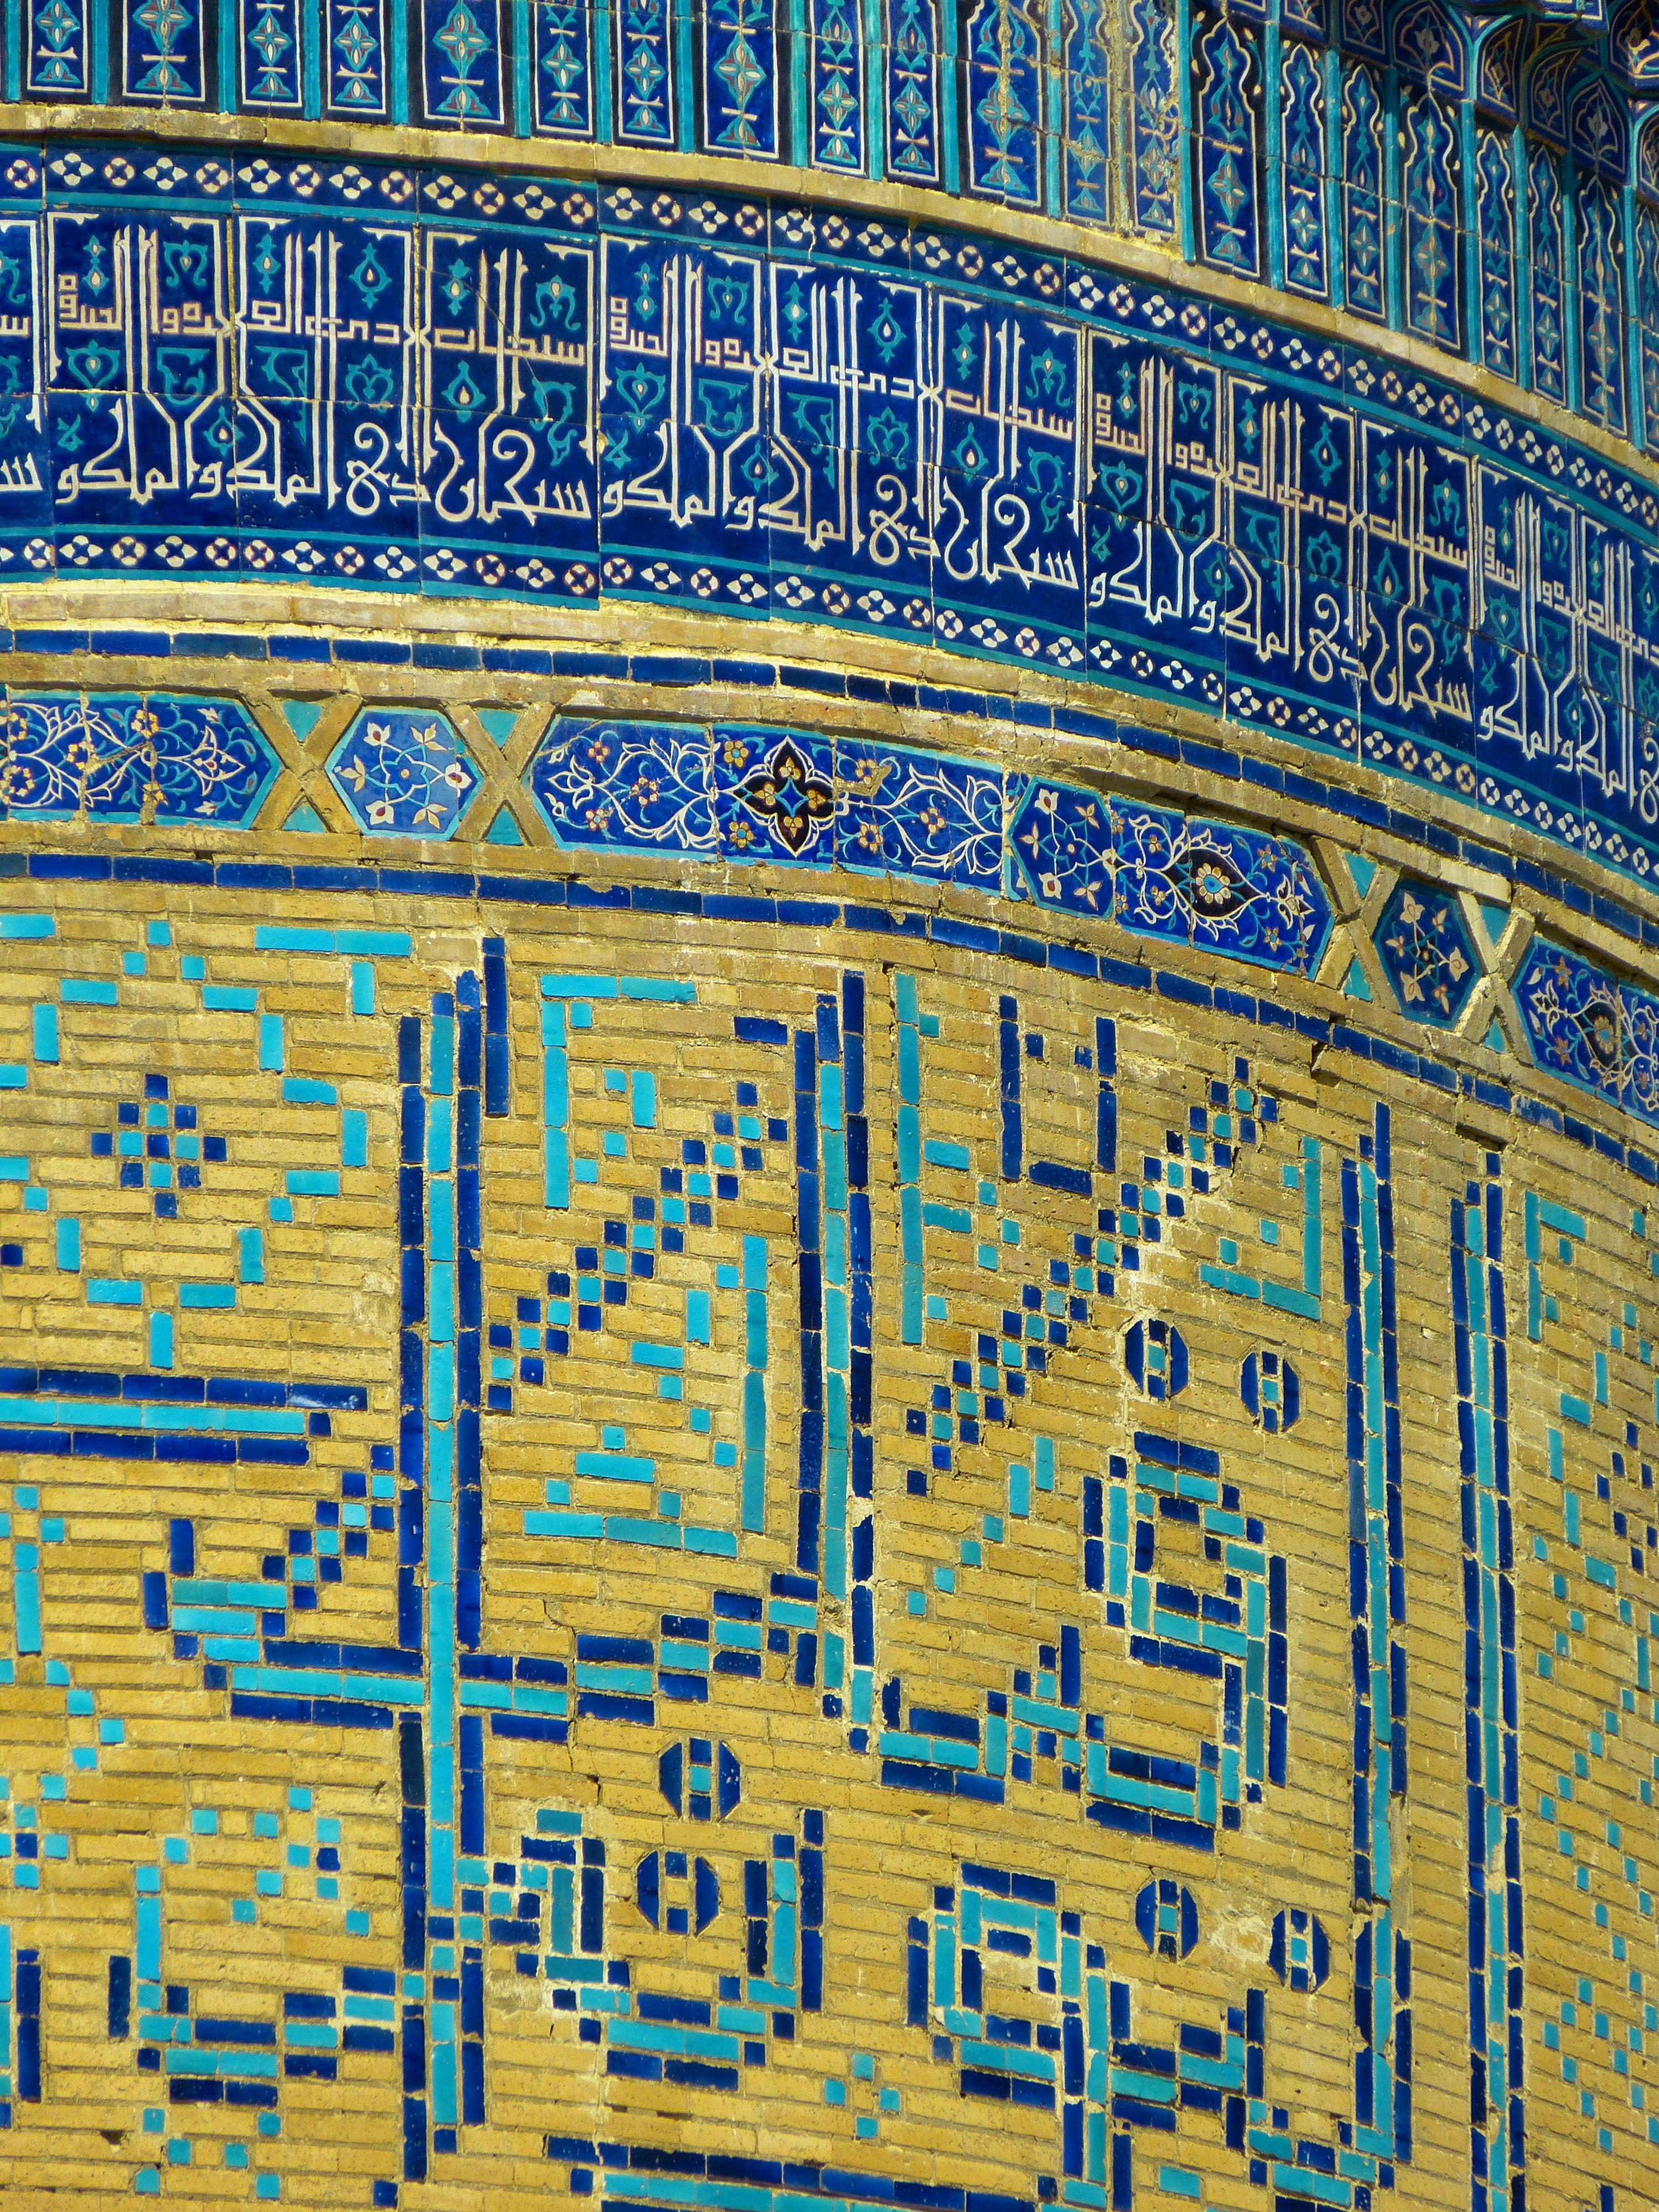 Free images pattern line ceramic tile font art turquoise pattern line ceramic tile font art turquoise design decorative symmetry mosaic tiles shape metropolis artfully uzbekistan dailygadgetfo Gallery